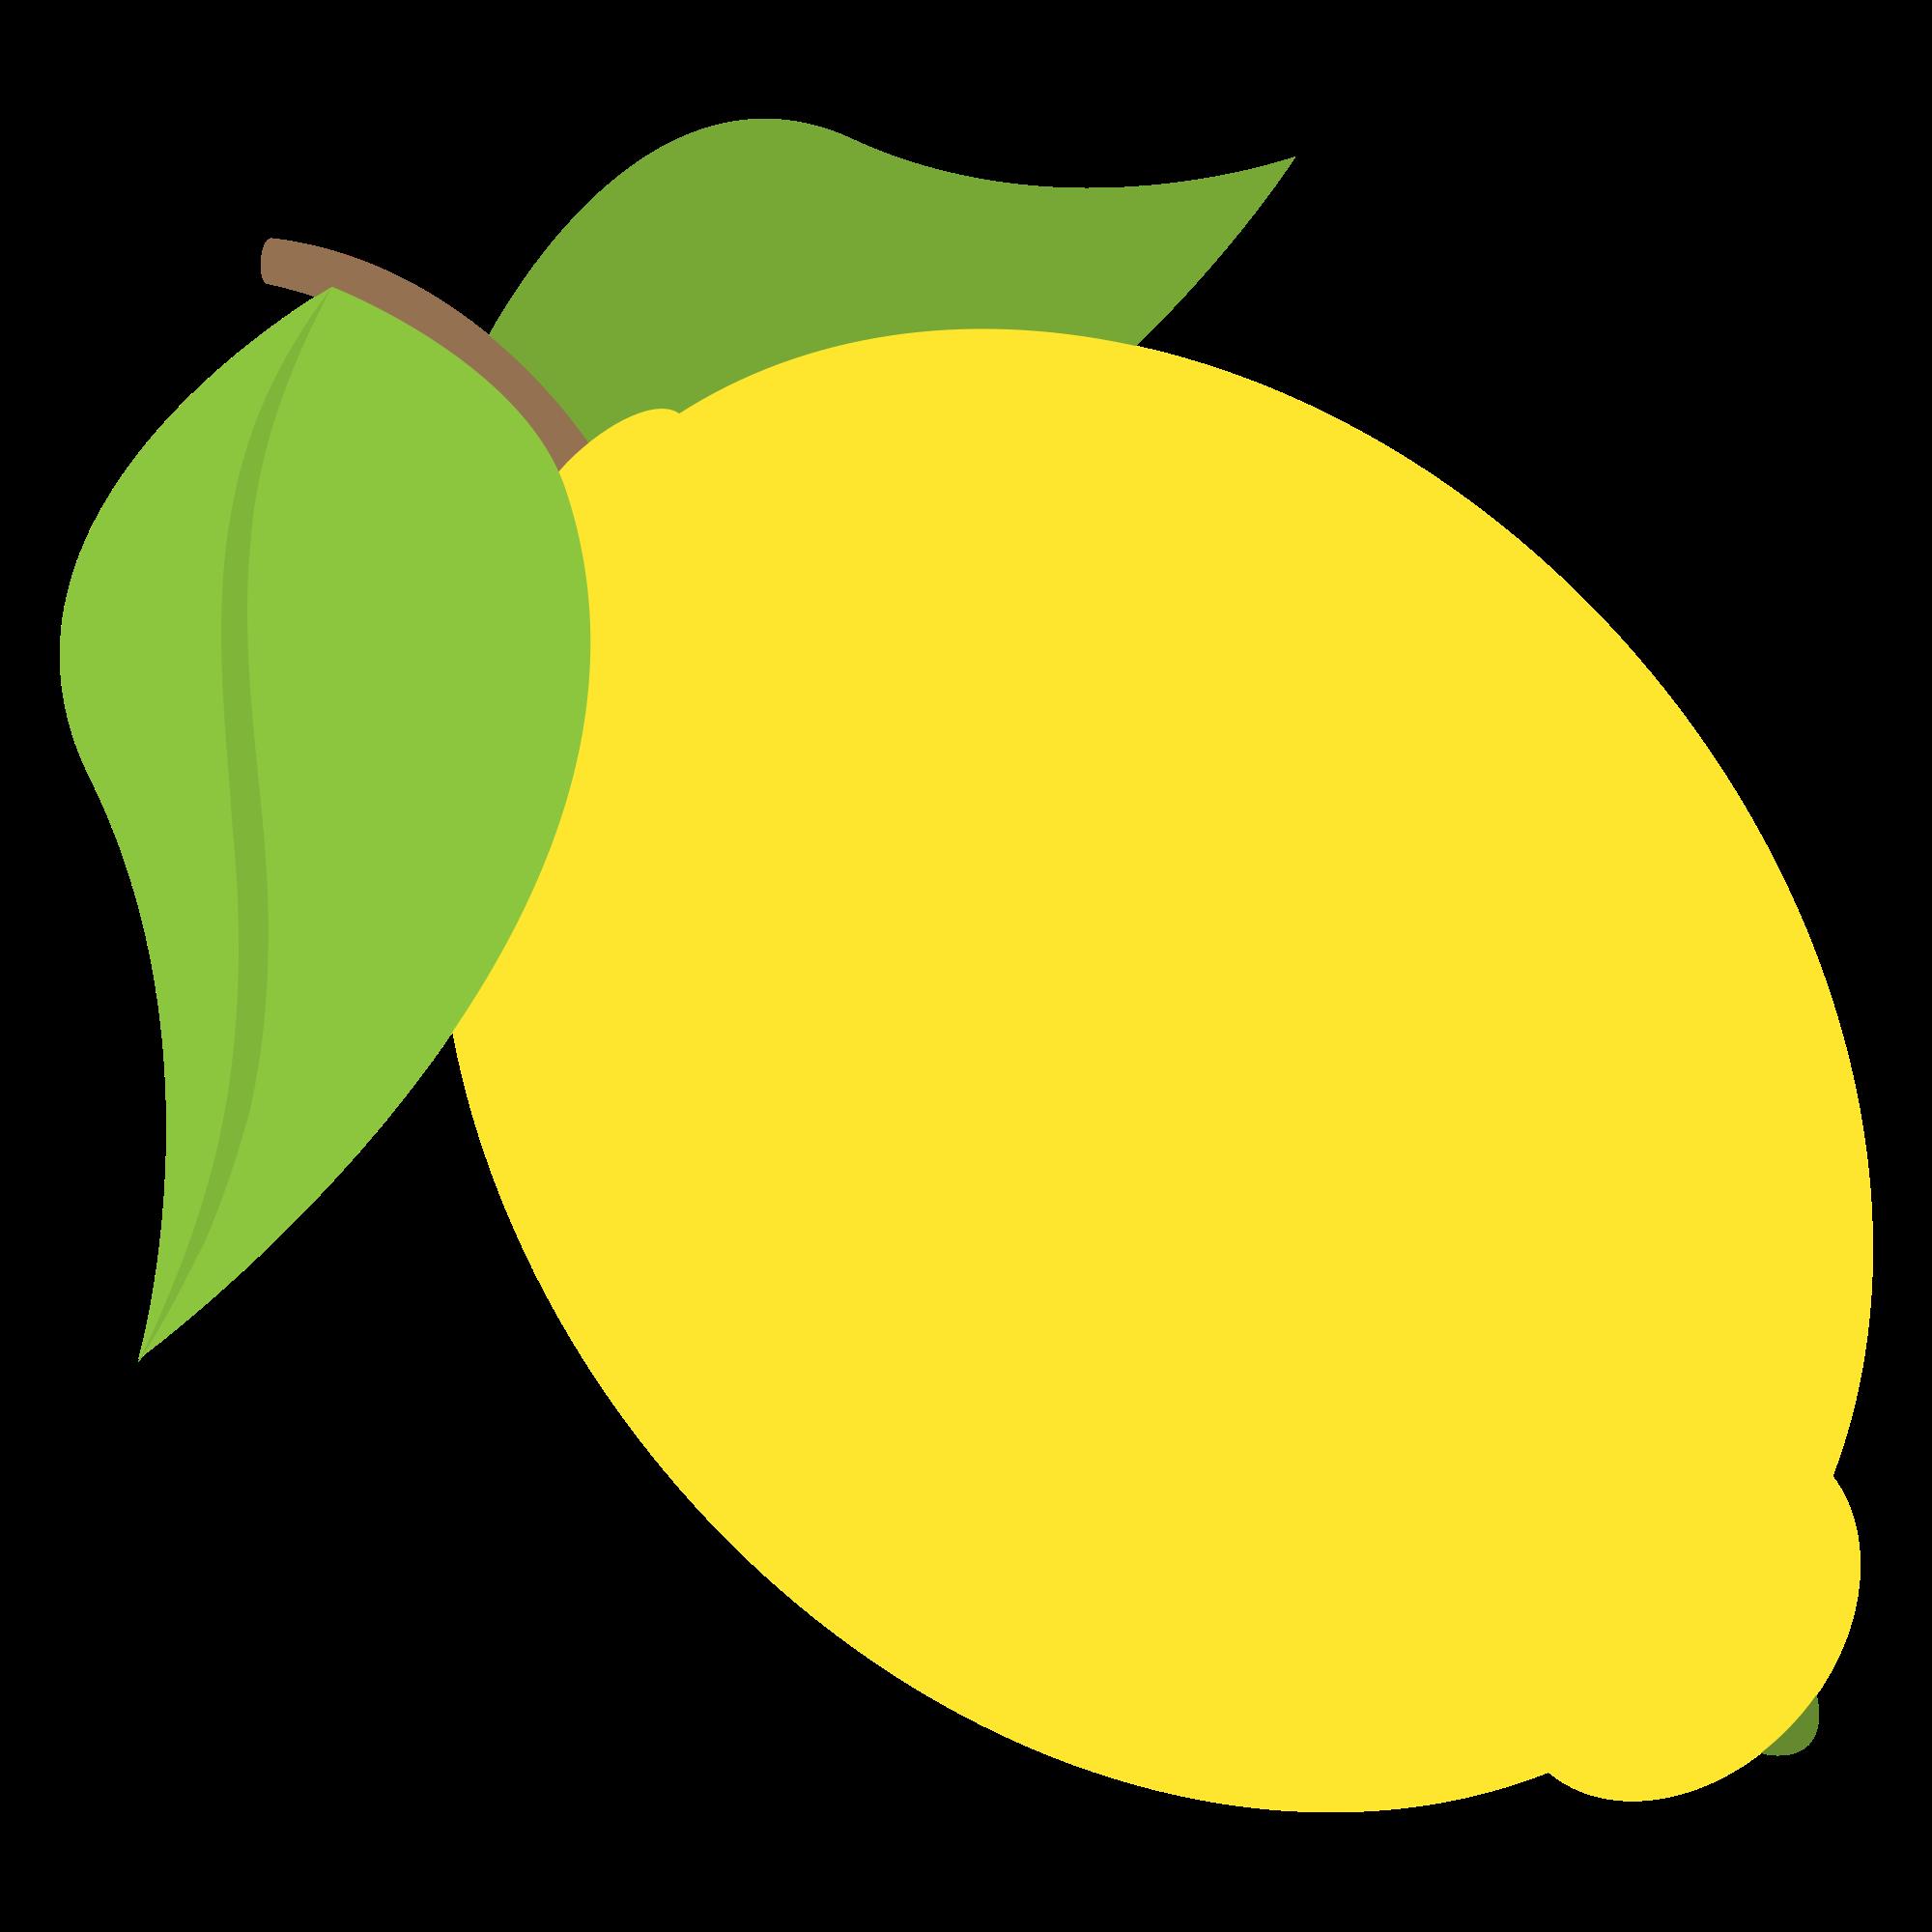 Lemons clipart svg. File emojione f b